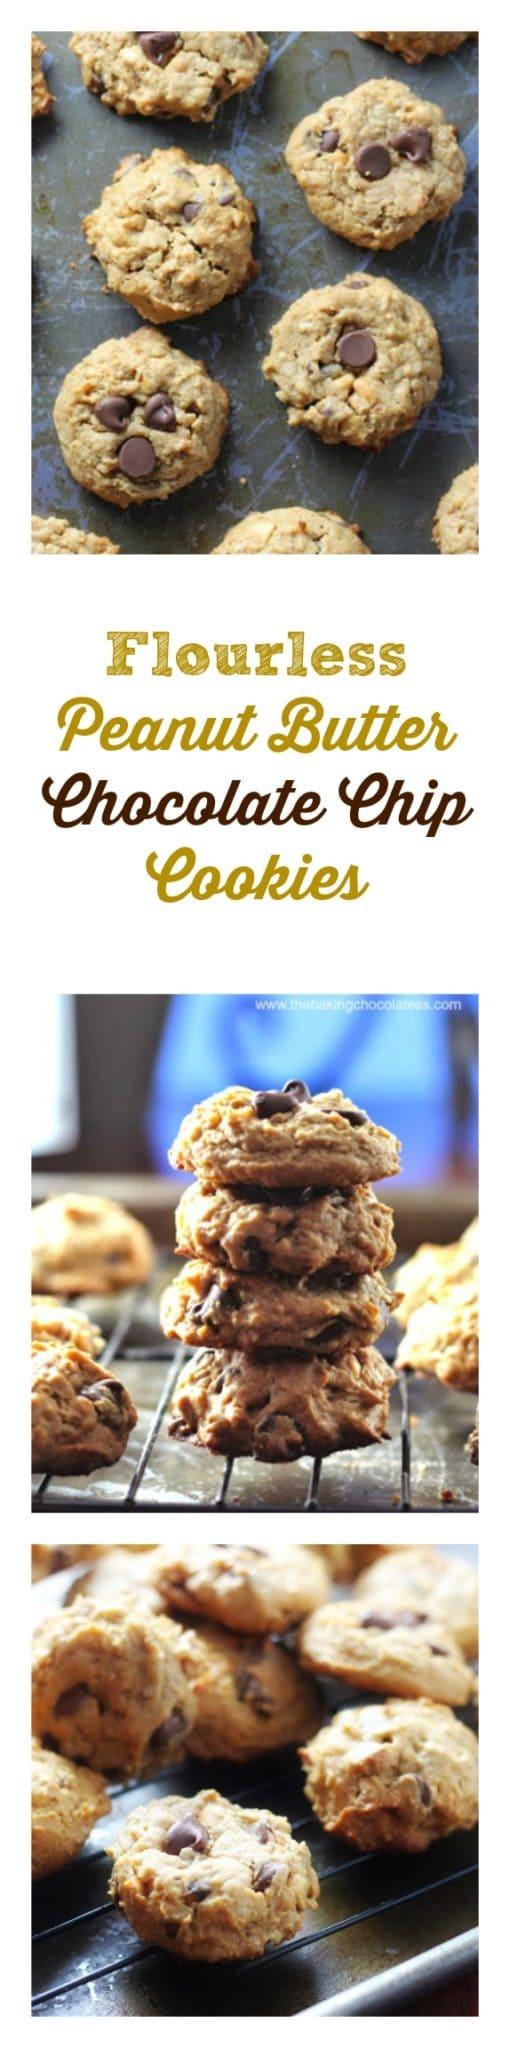 Flourless Peanut Butter Chocolate Chip Cookies {GF, No Butter, Naturally Sweetened}